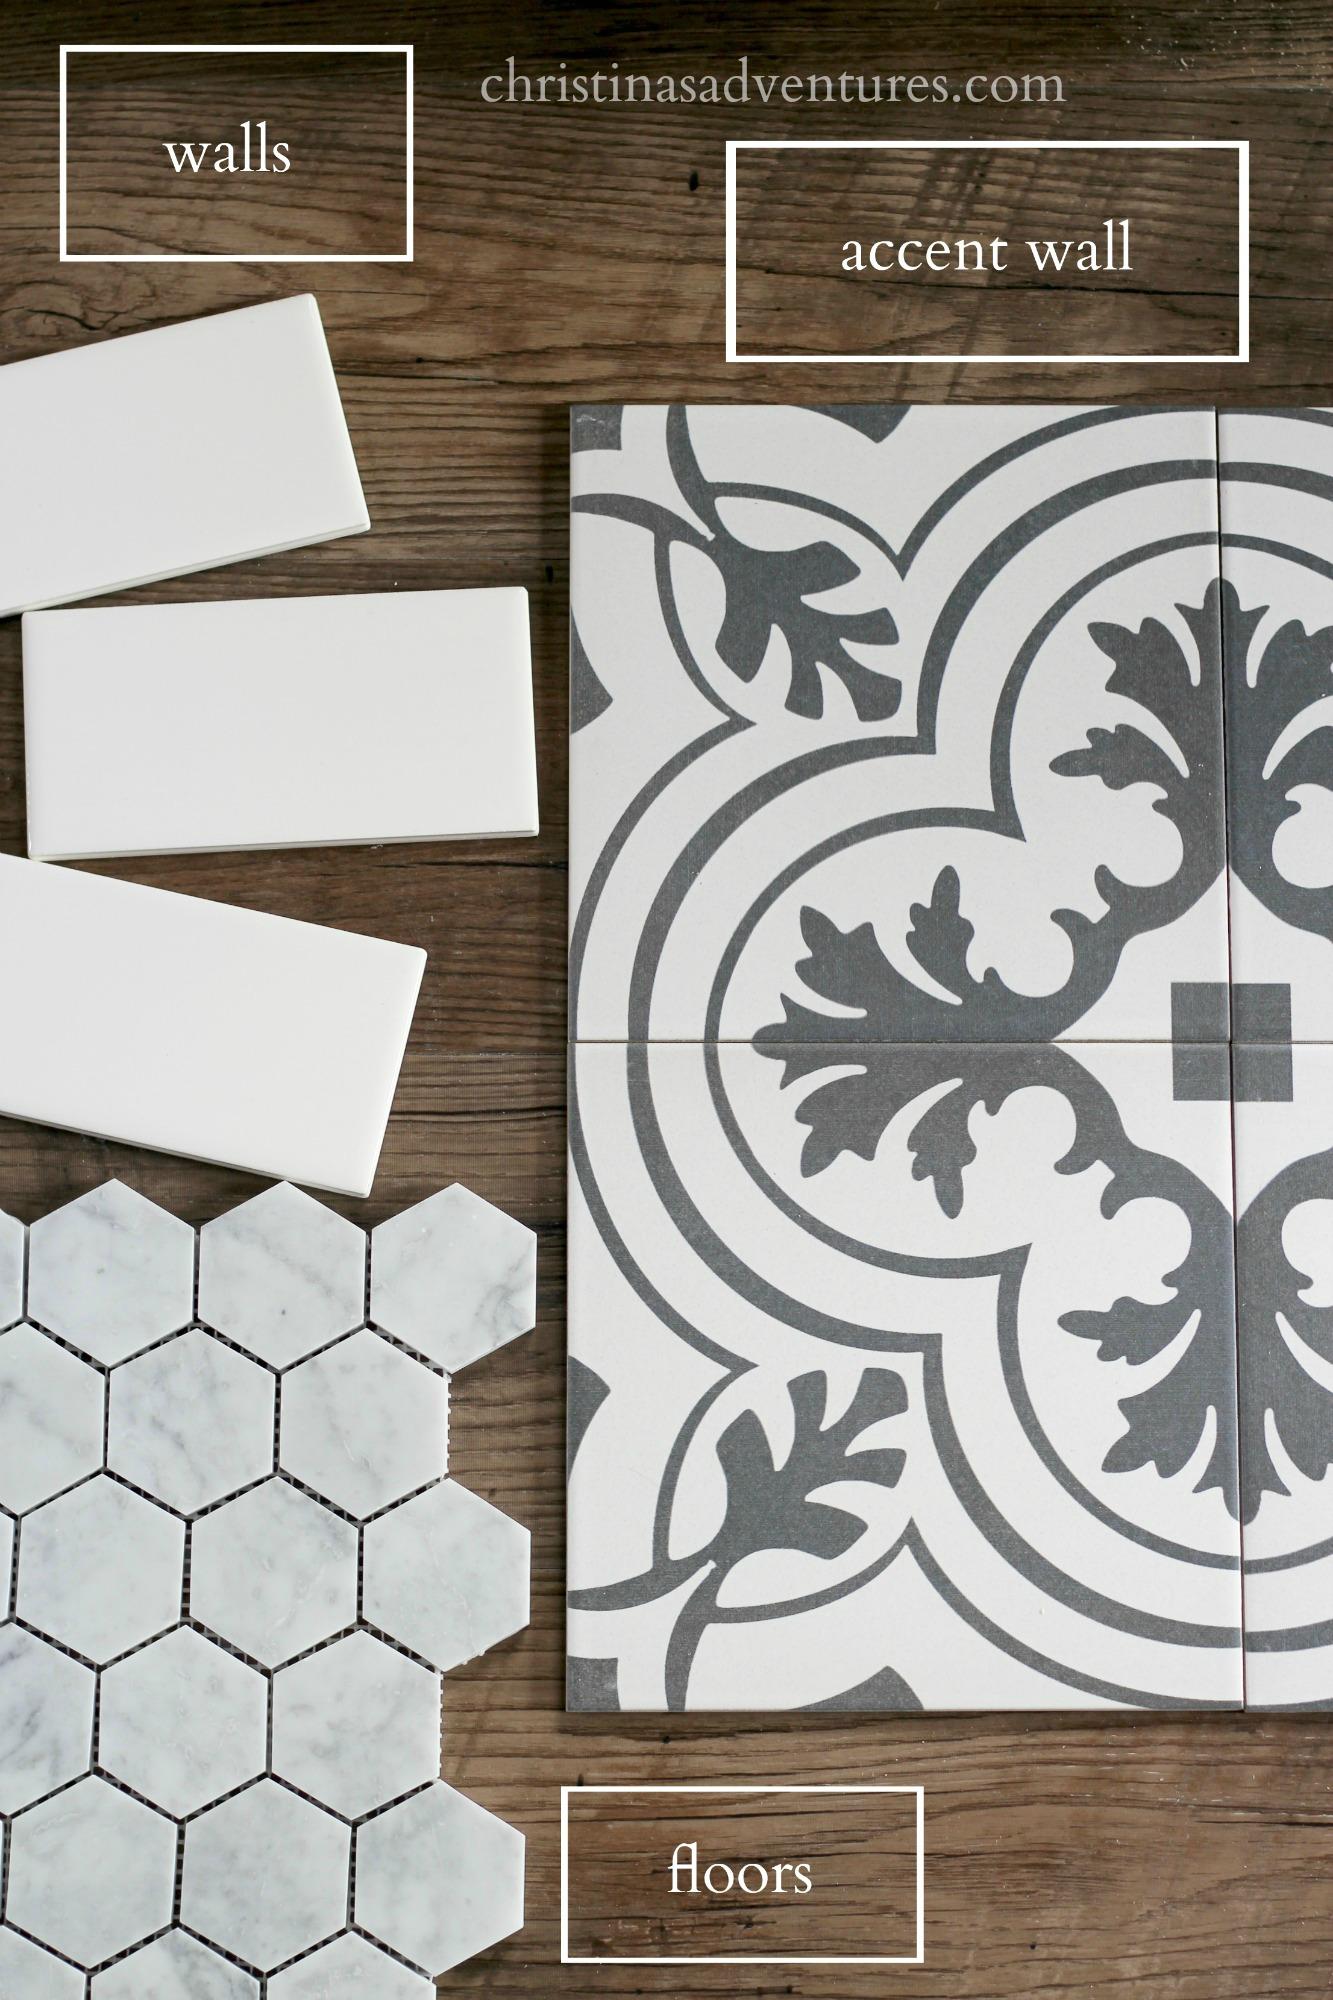 Affordable bathroom tile designs - Christinas Adventures on Bathroom Tile Designs  id=71132